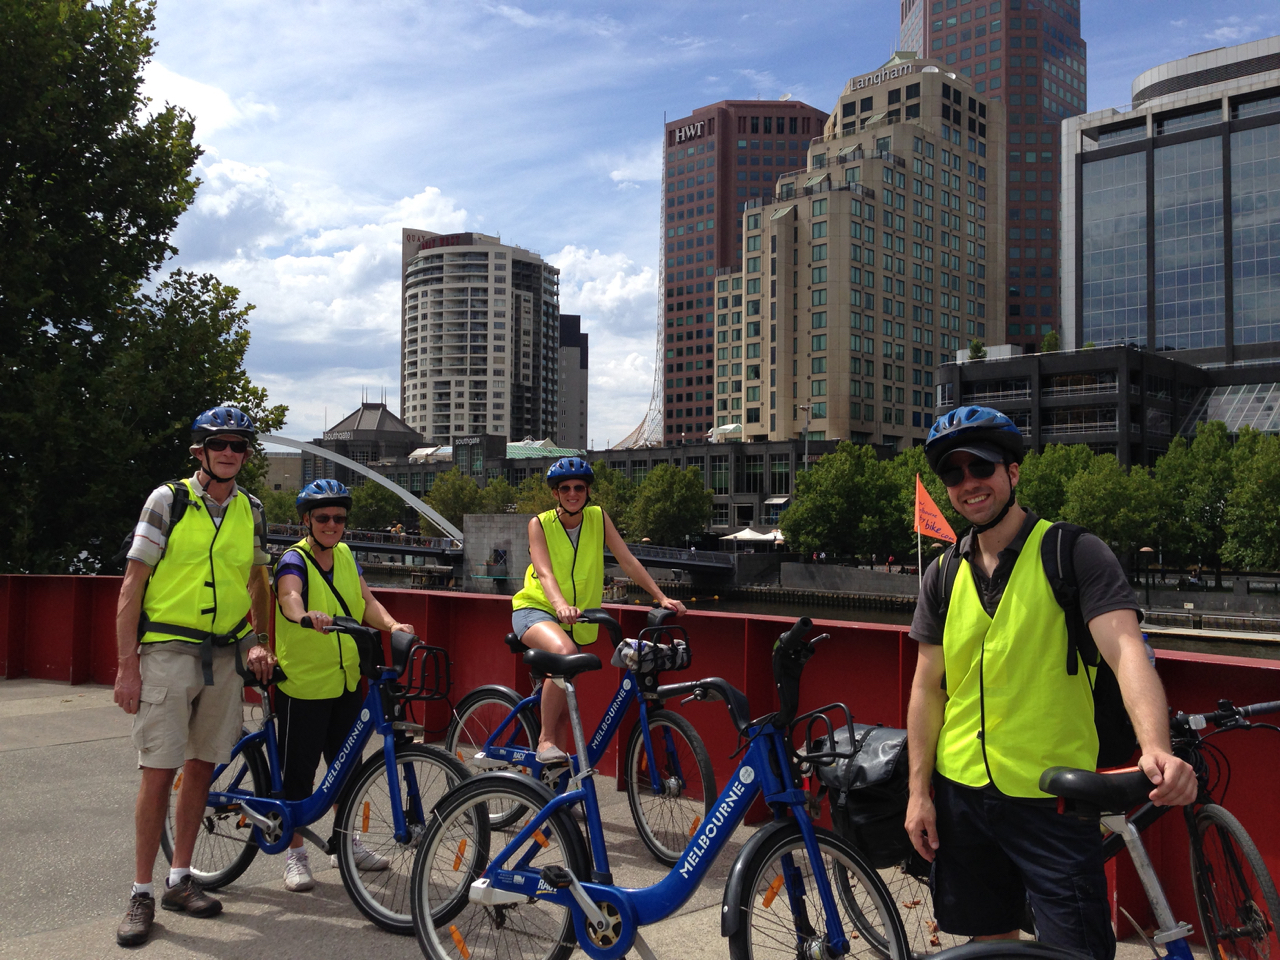 Melbourne 2hour River Loop tour - City Cycle Tours